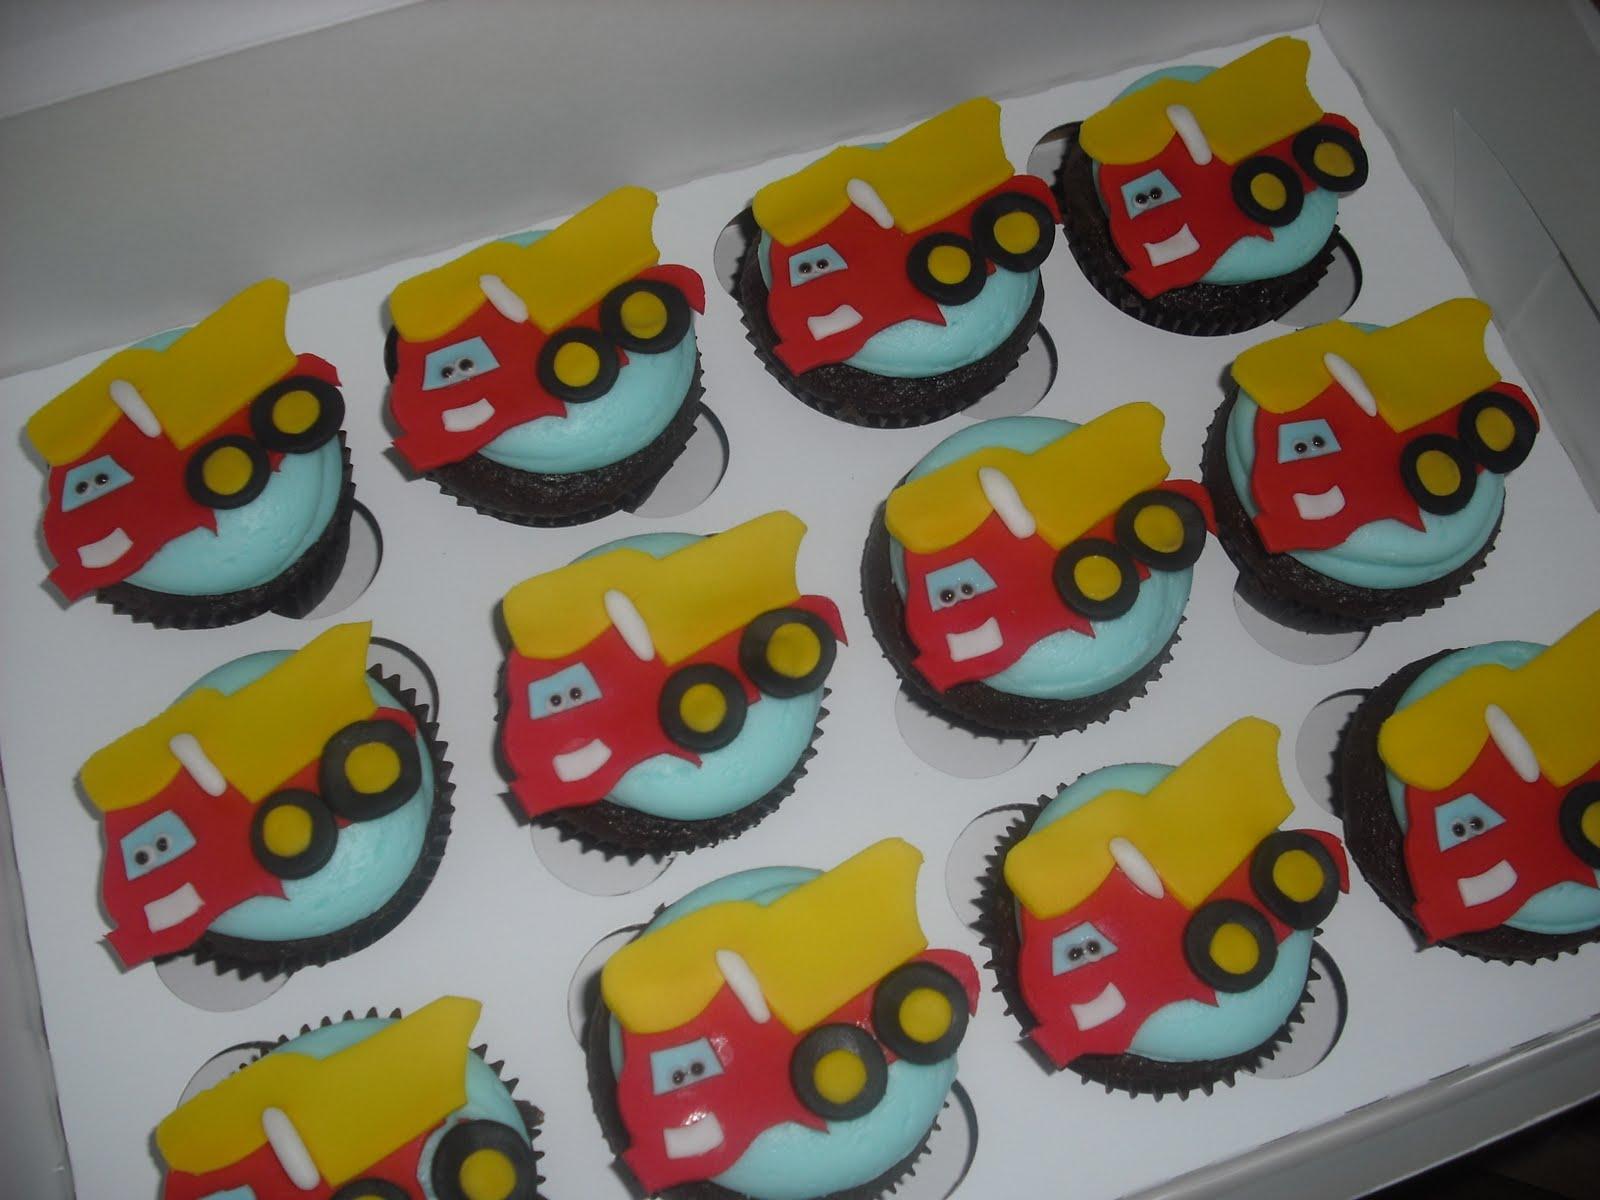 Cake Decorating Supplies Near Me